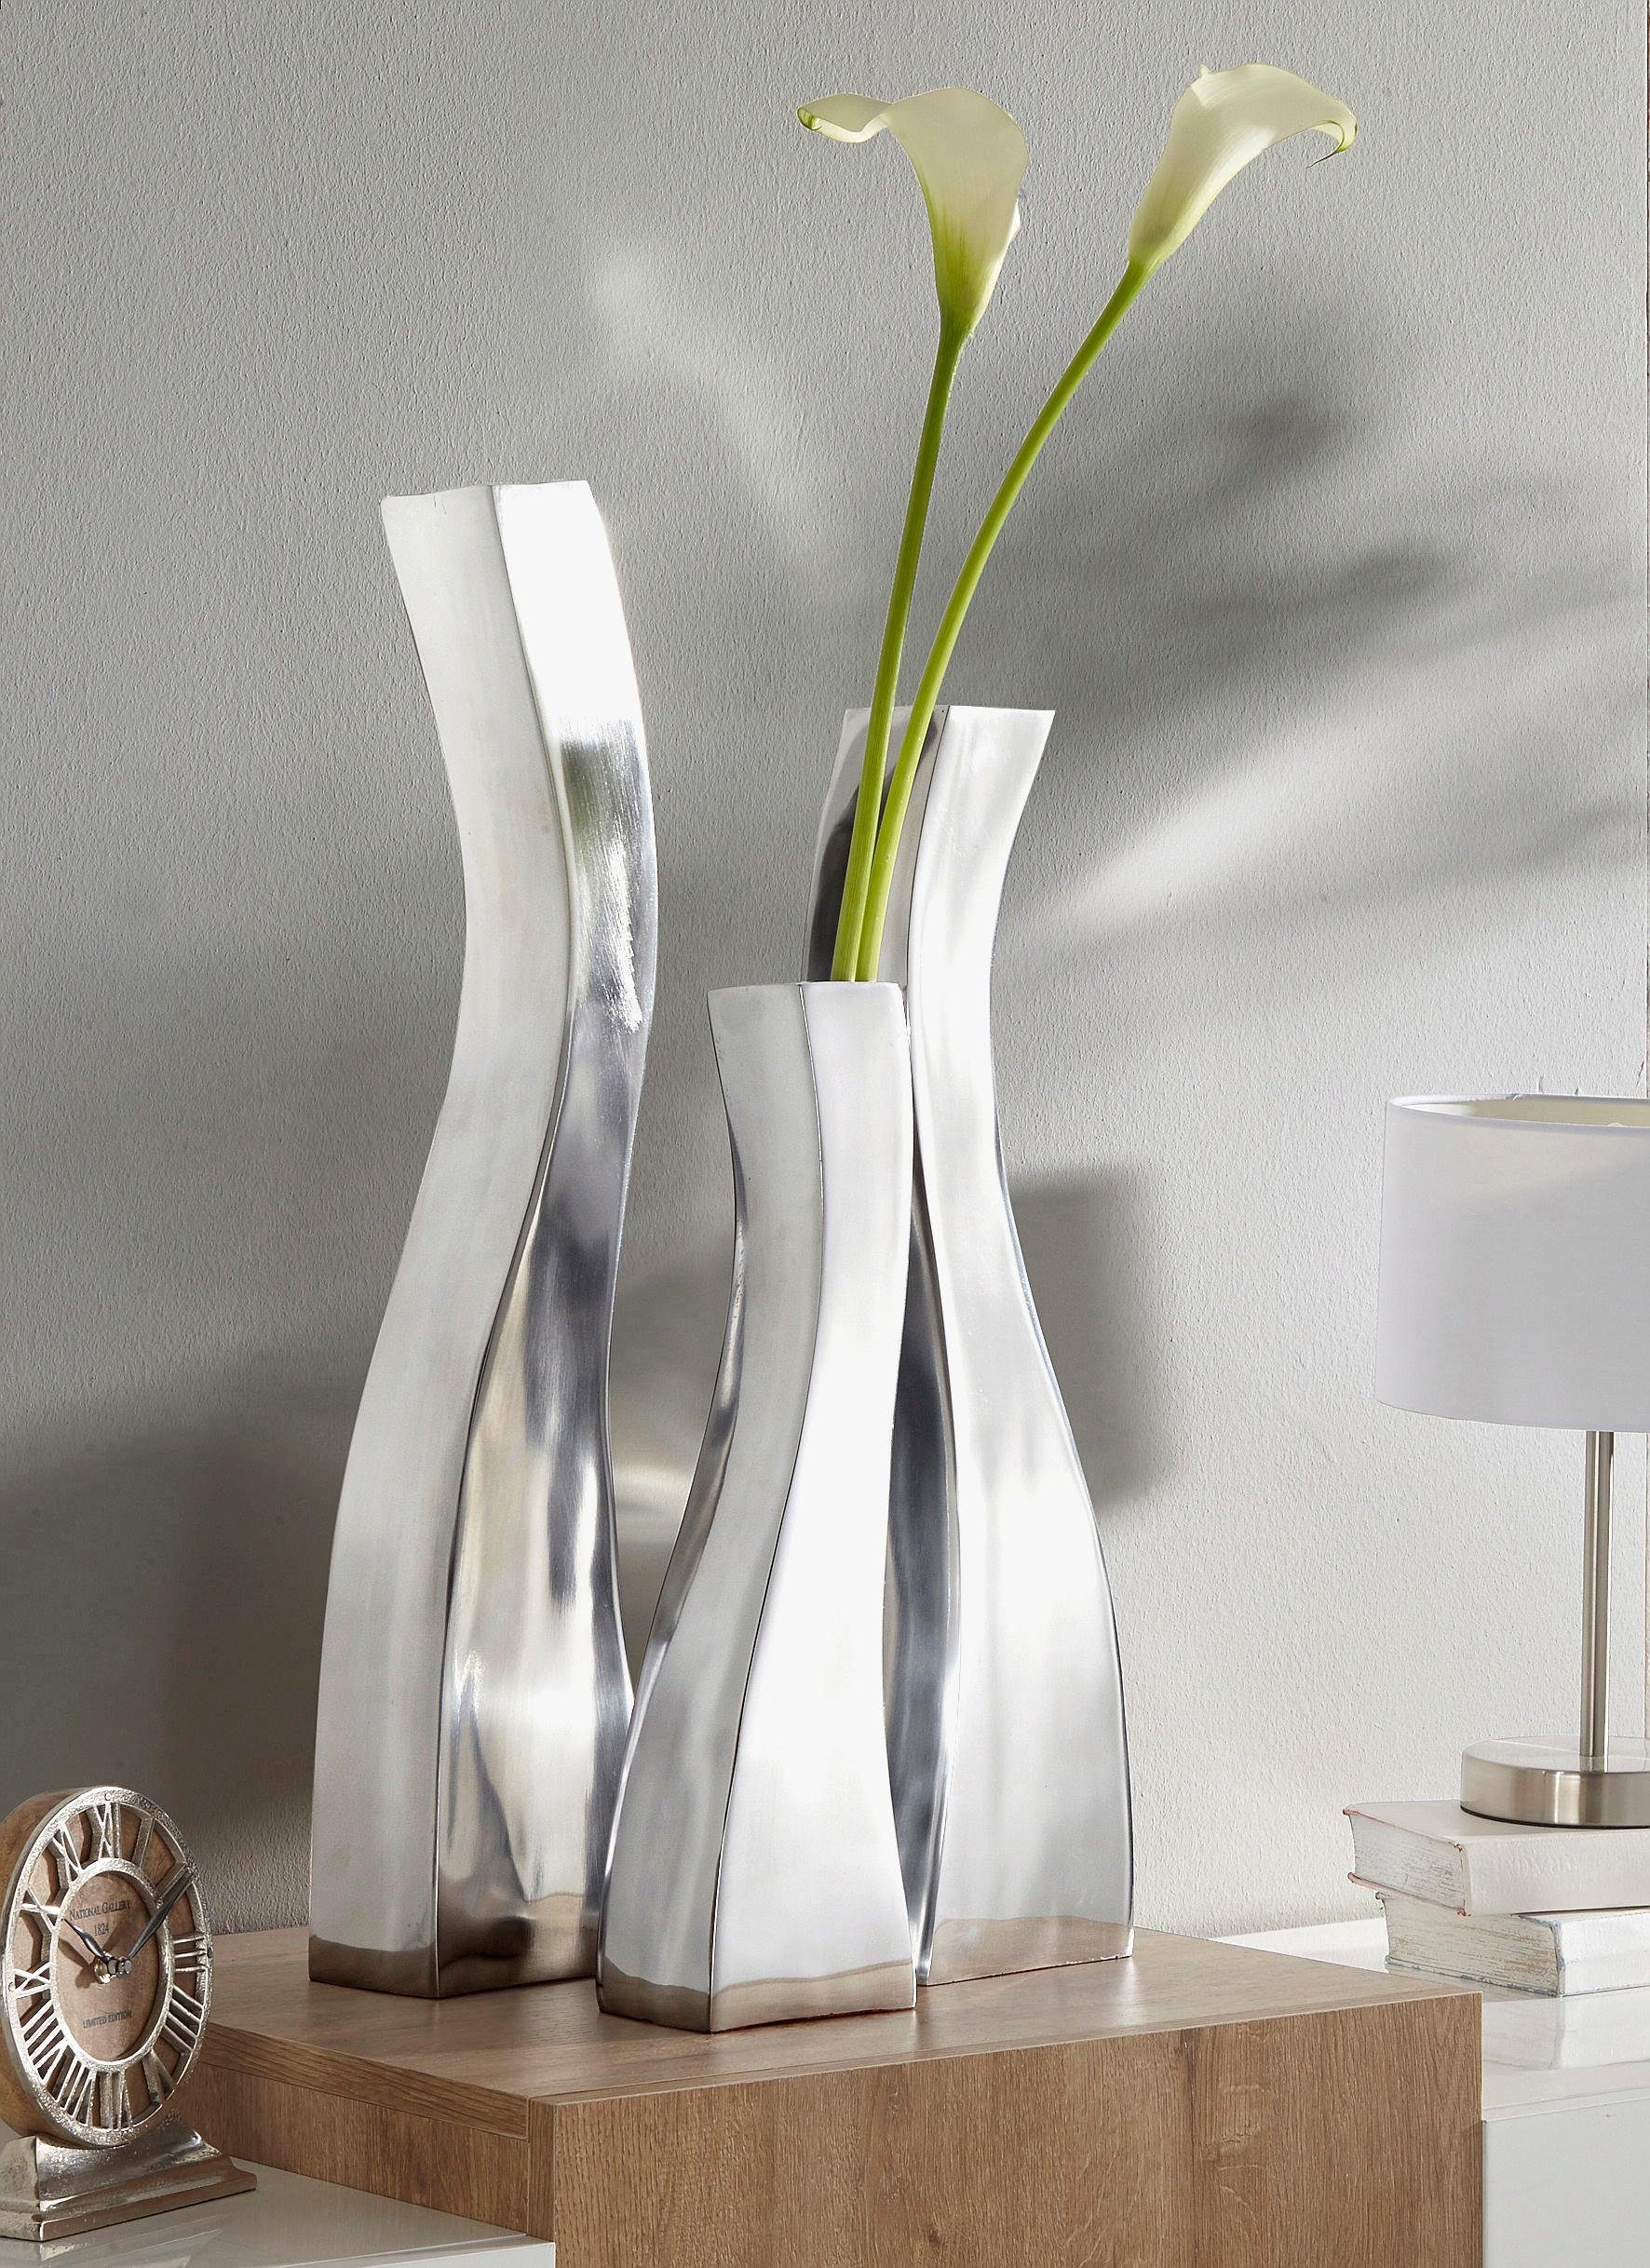 Premium collection by Home affaire Aluminium Vasen Welle